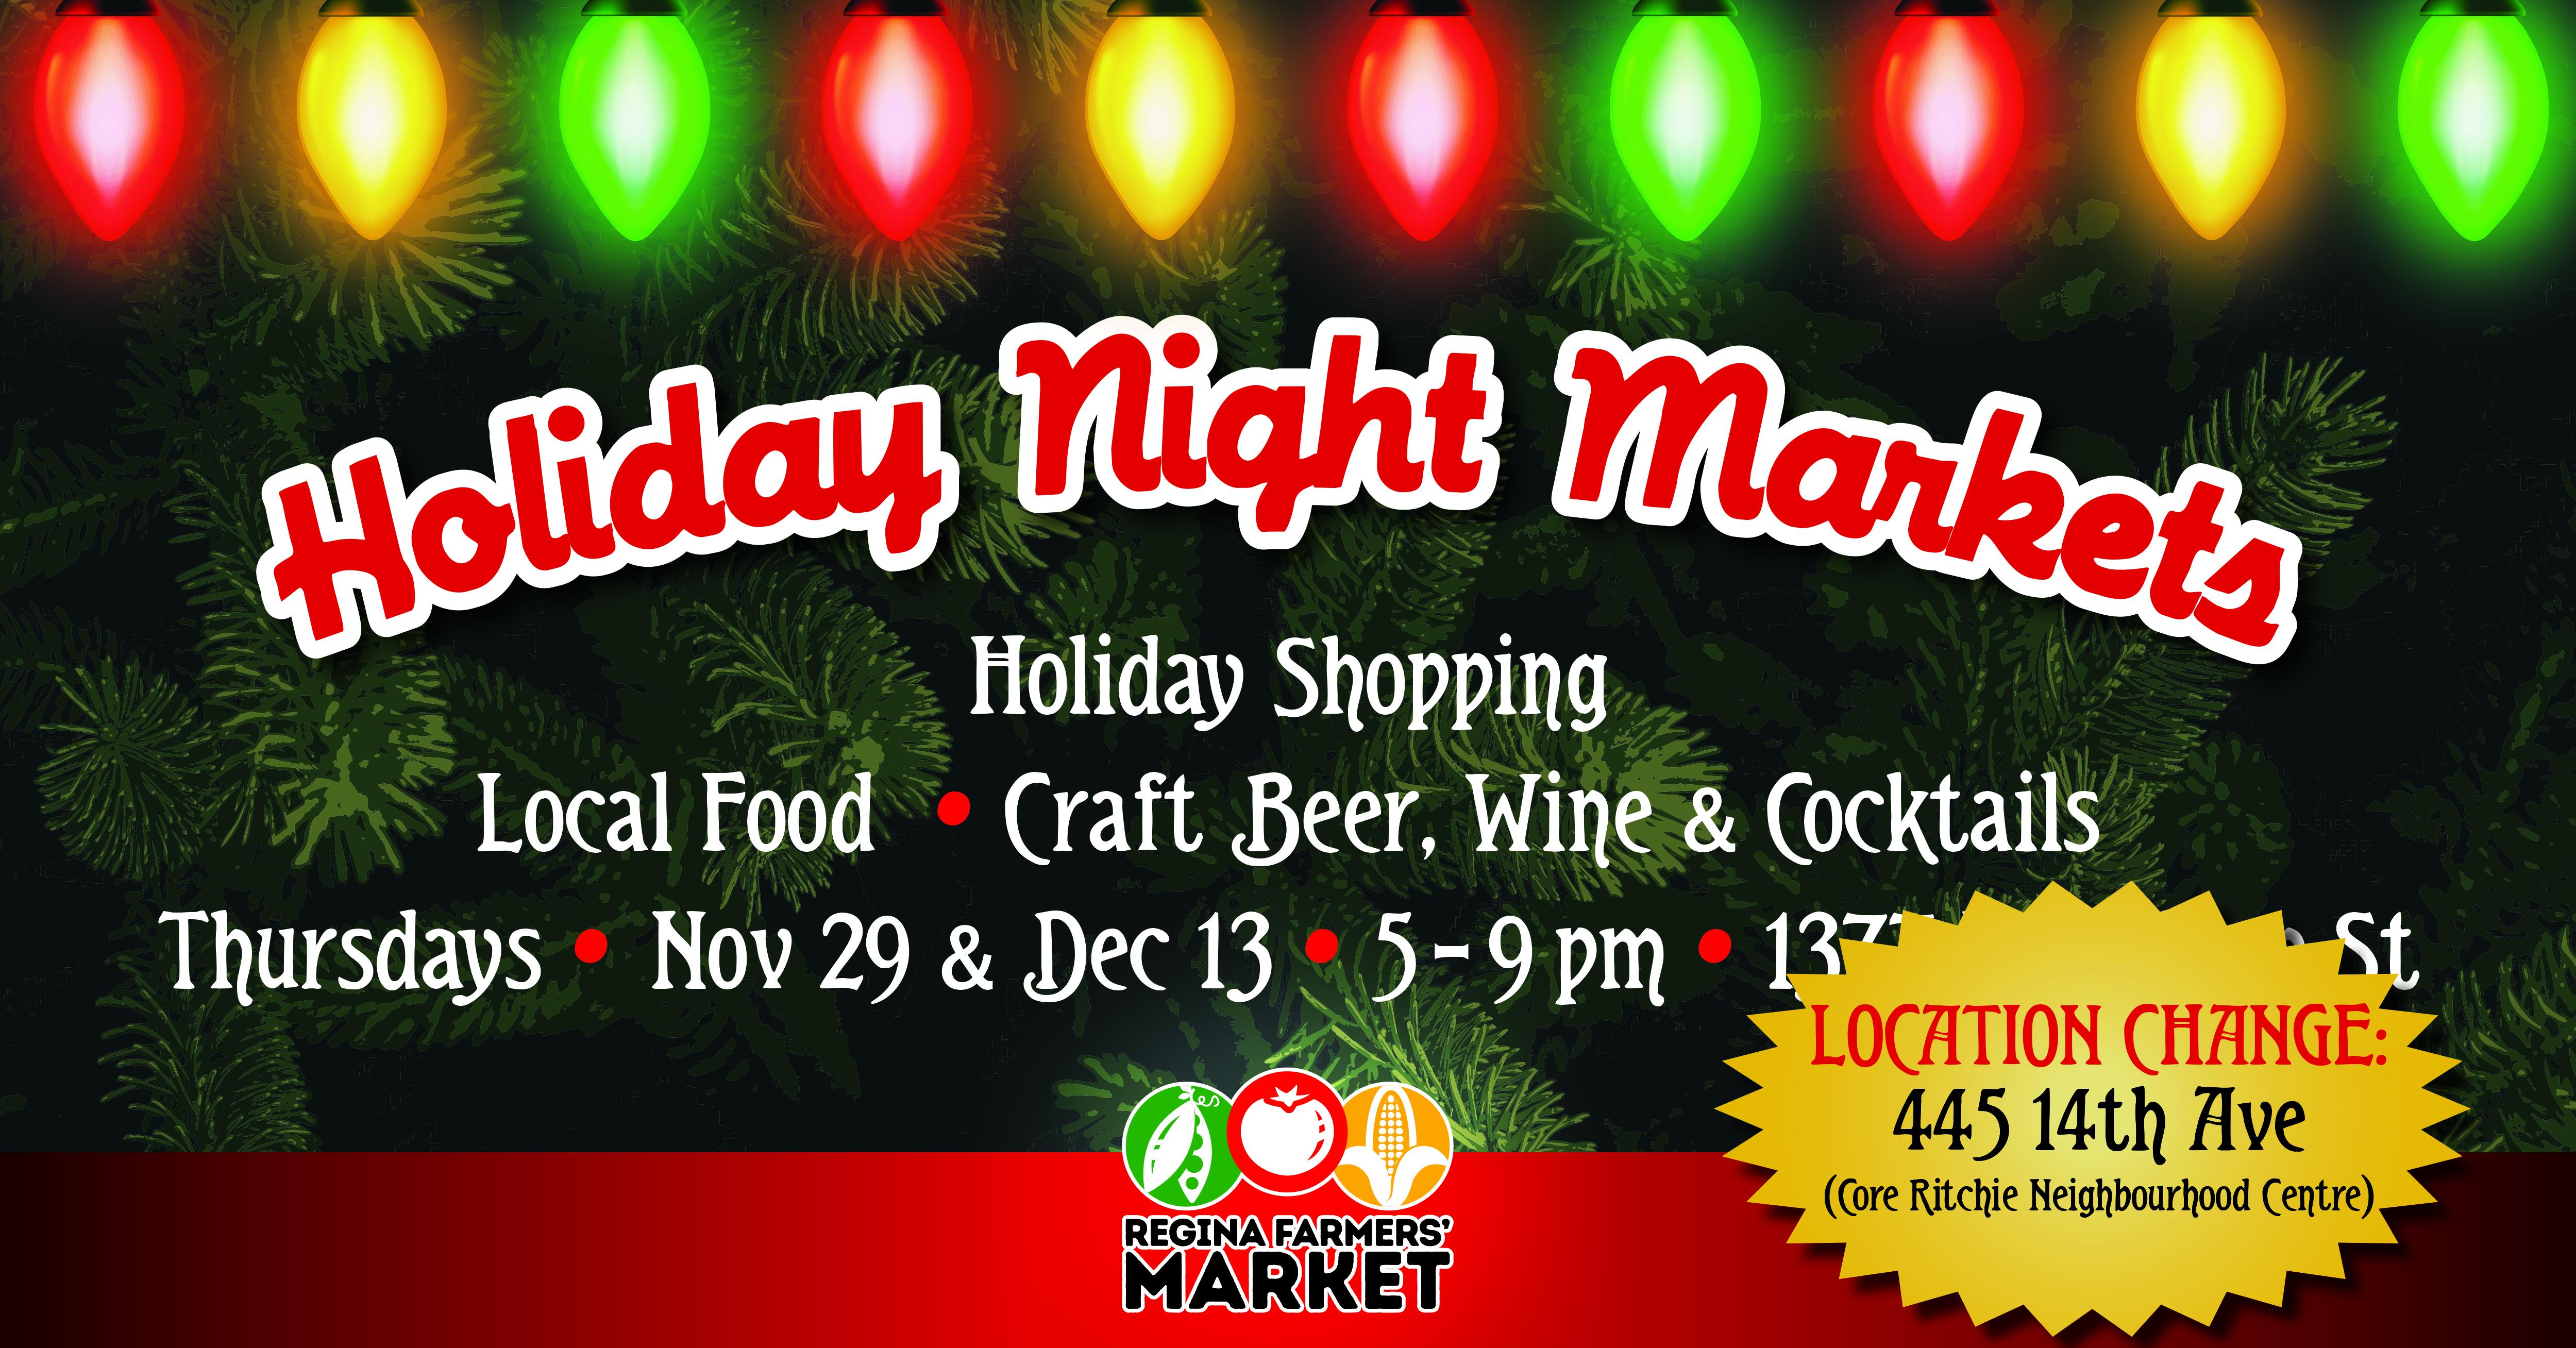 Holiday Night Market (LOCATION CHANGE!)